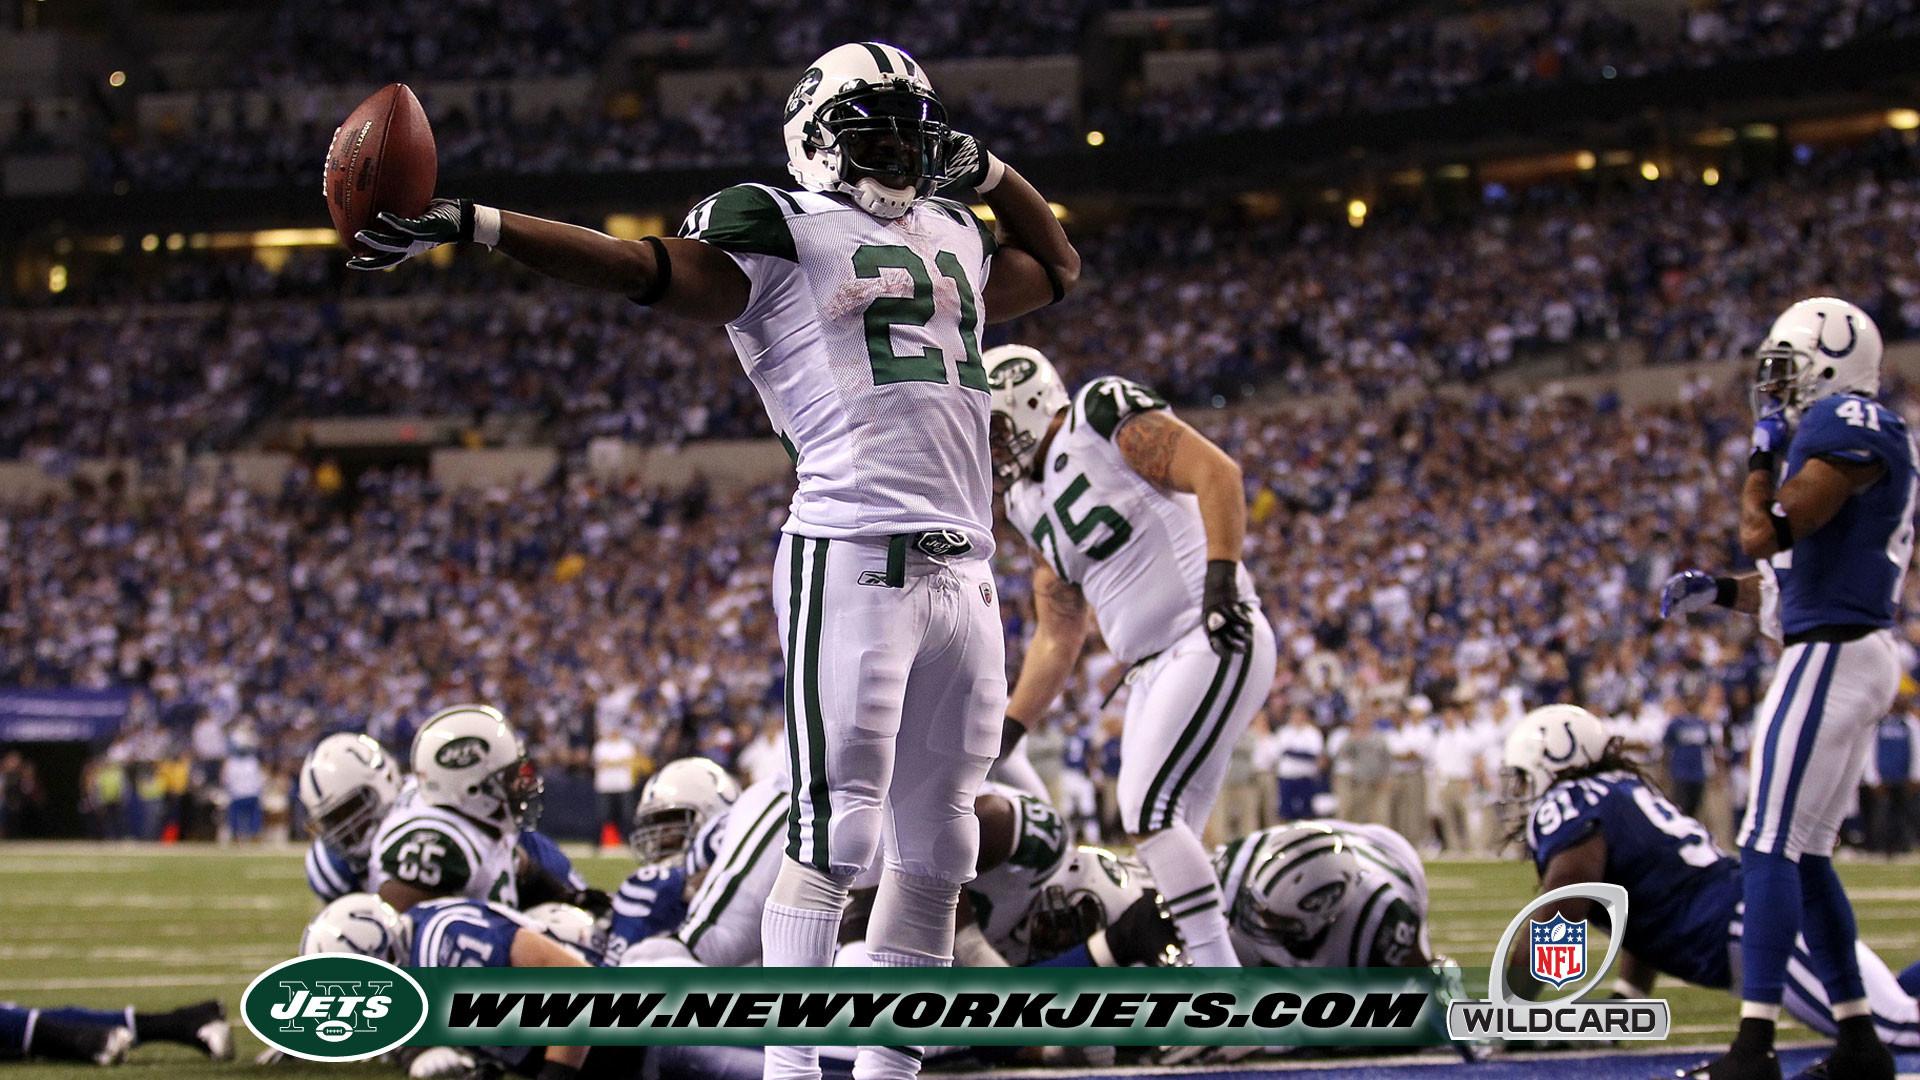 Ladainian Tomlinson New York Jets wallpaper – 500223